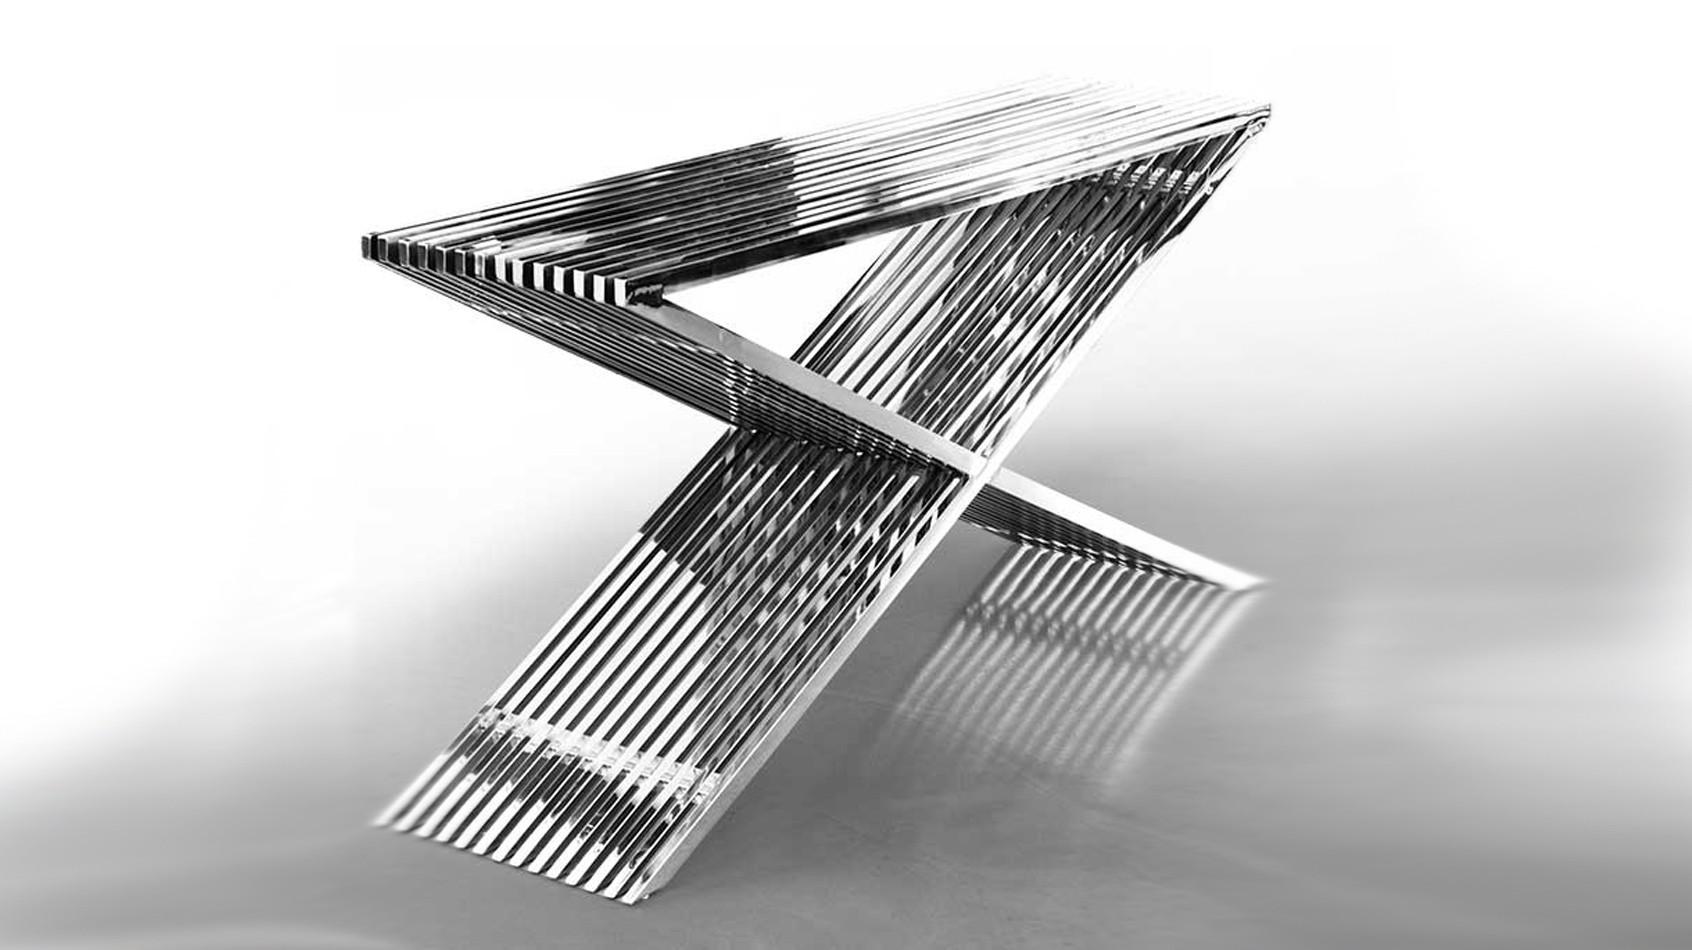 Edelstahl-Sideboard Edelstahl-Regal Highboard. Edelstahl Hocker, Tisch und Bank